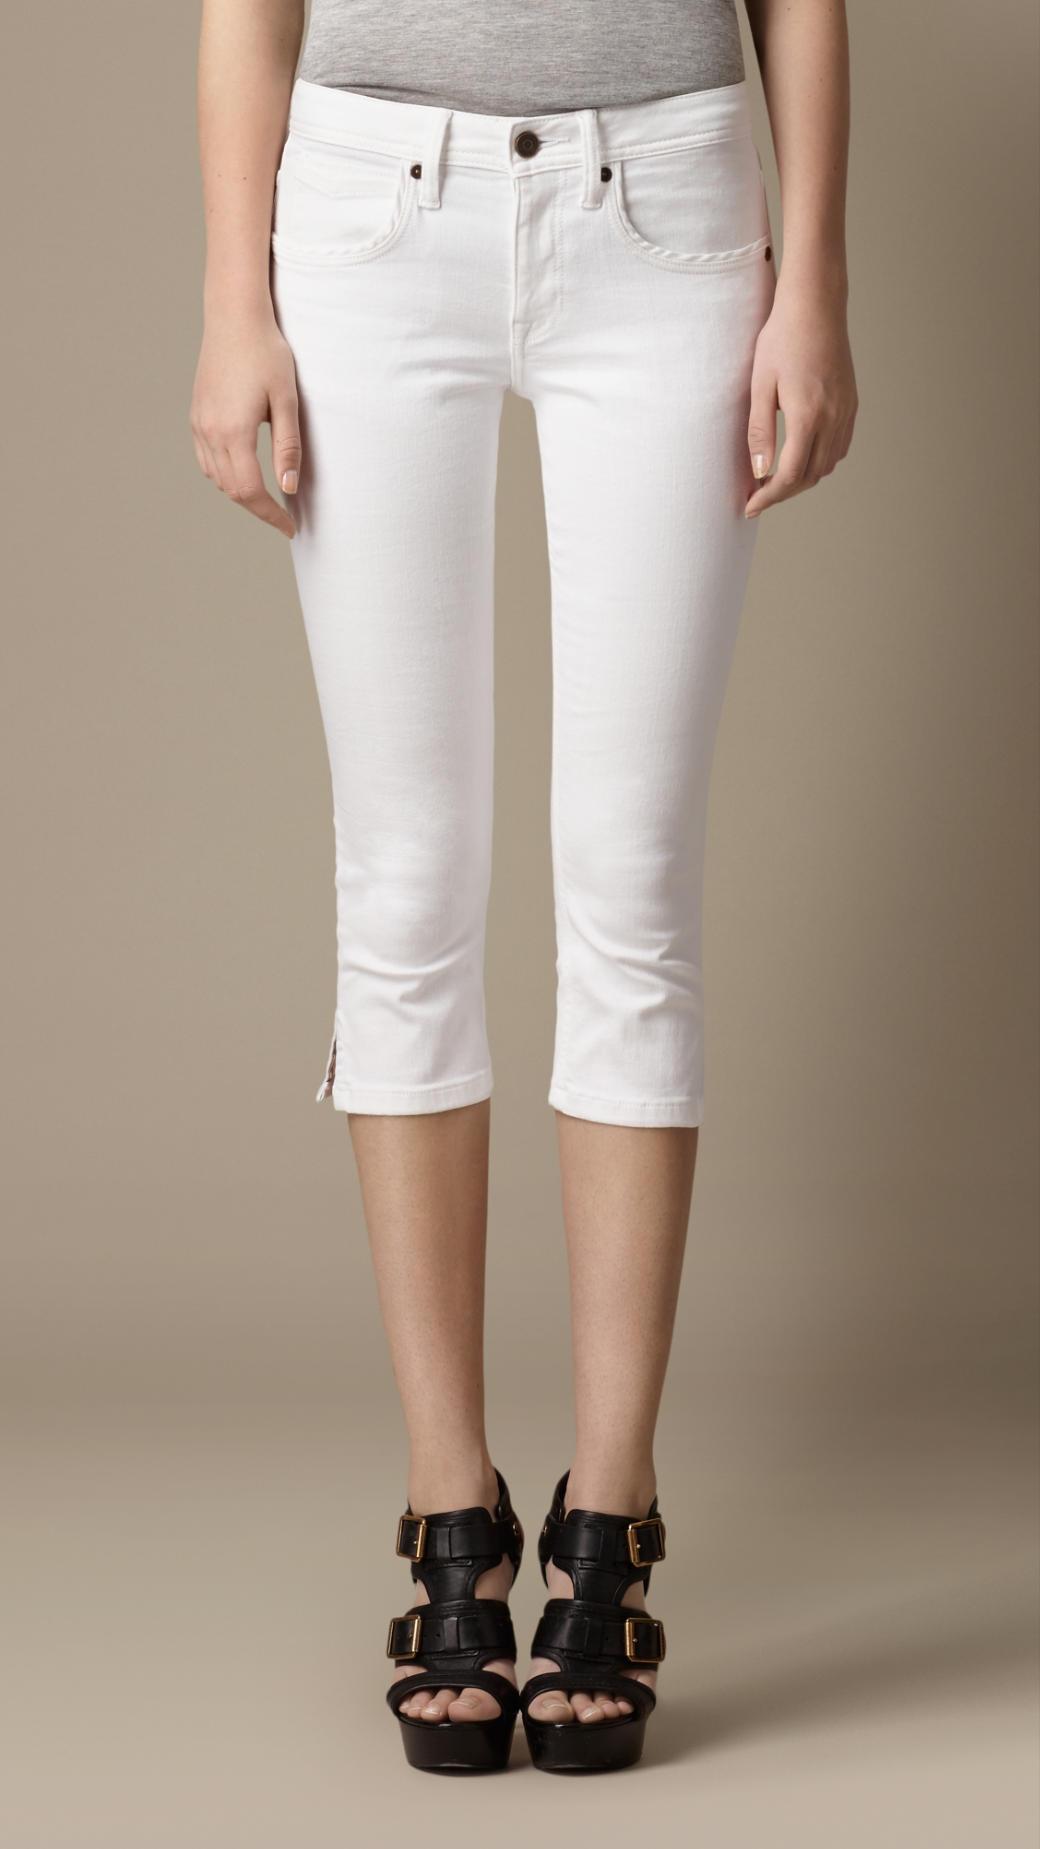 Burberry Doverdale White Skinny Fit Capri Jeans in White | Lyst